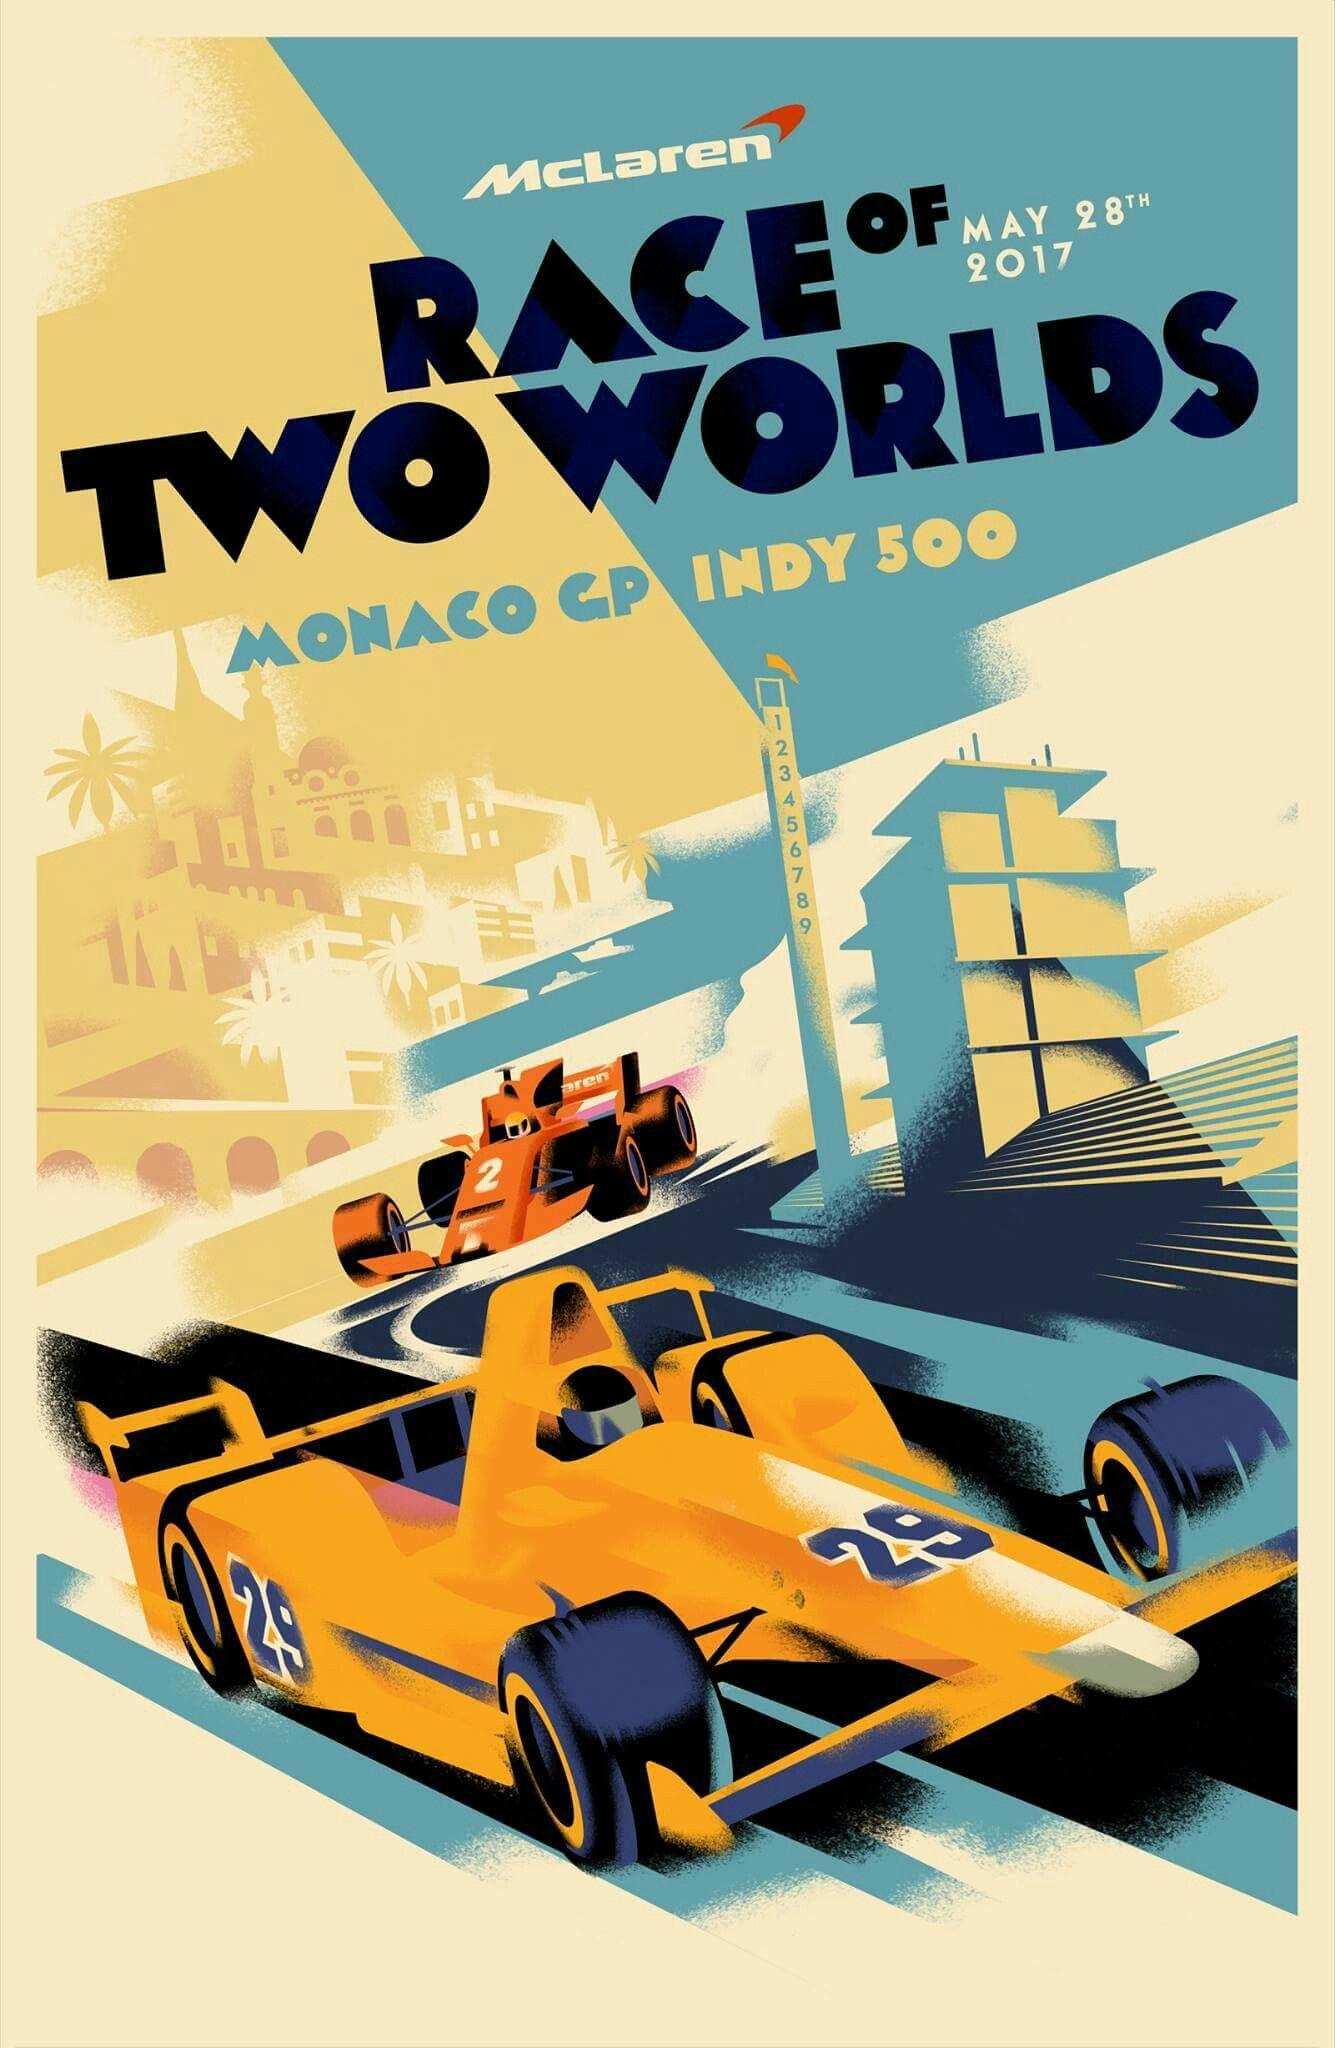 Pin by Max Terán Carpio on Formula 1 | Pinterest | Monaco, F1 and ...